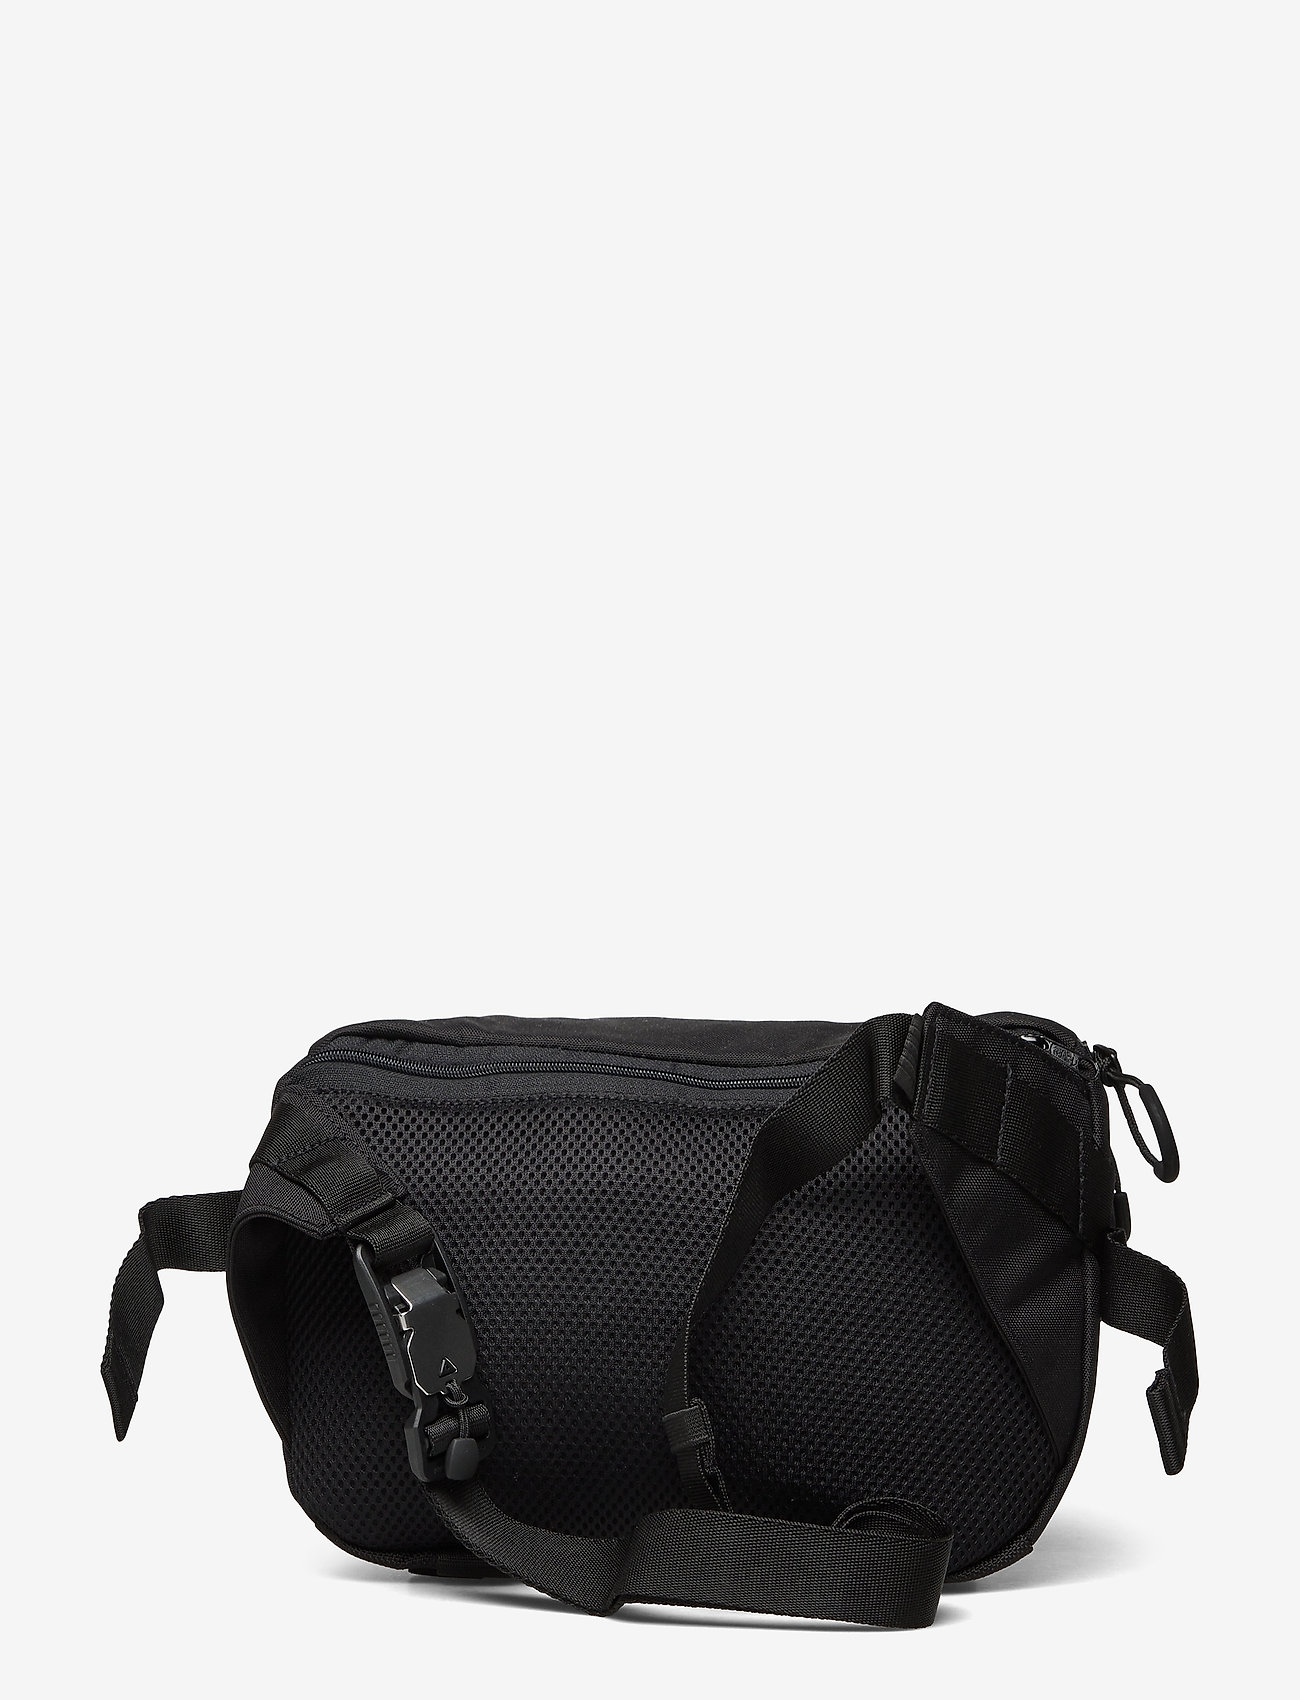 adidas Originals - ADVNTR WB L - heuptassen - black/mgsogr - 1